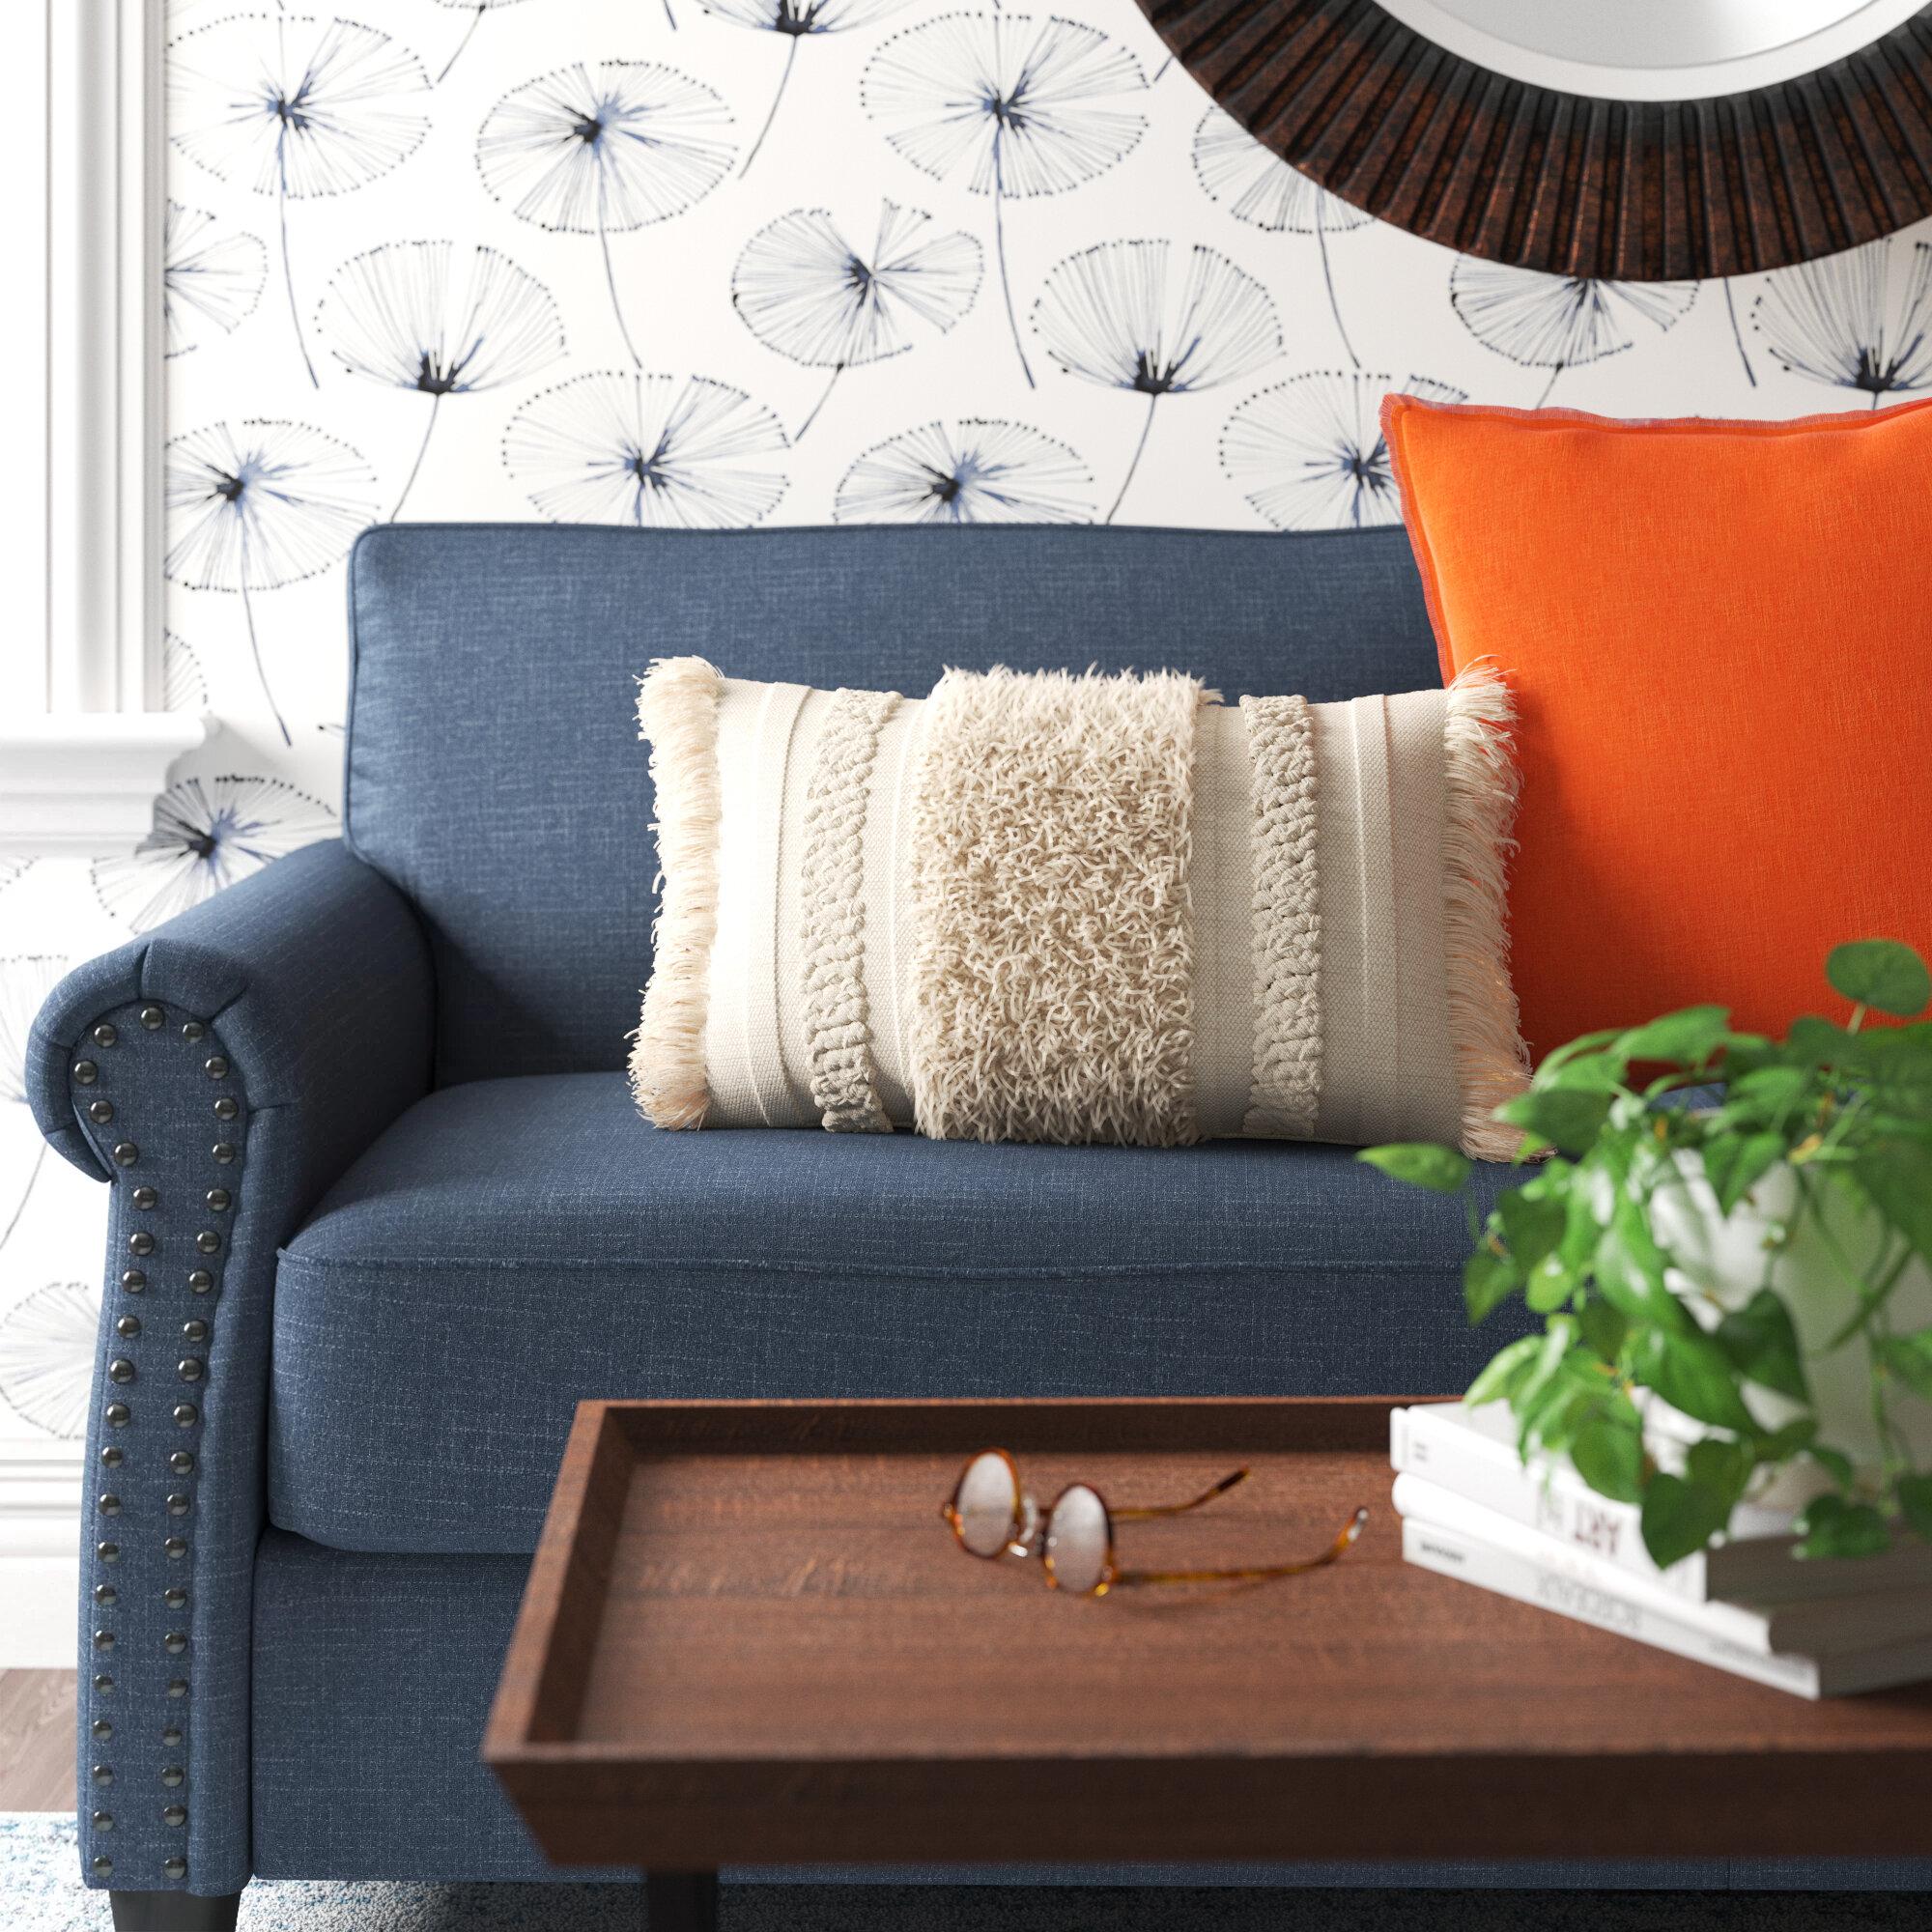 Washington Mews Cotton Feathers Striped Lumbar Pillow Reviews Joss Main